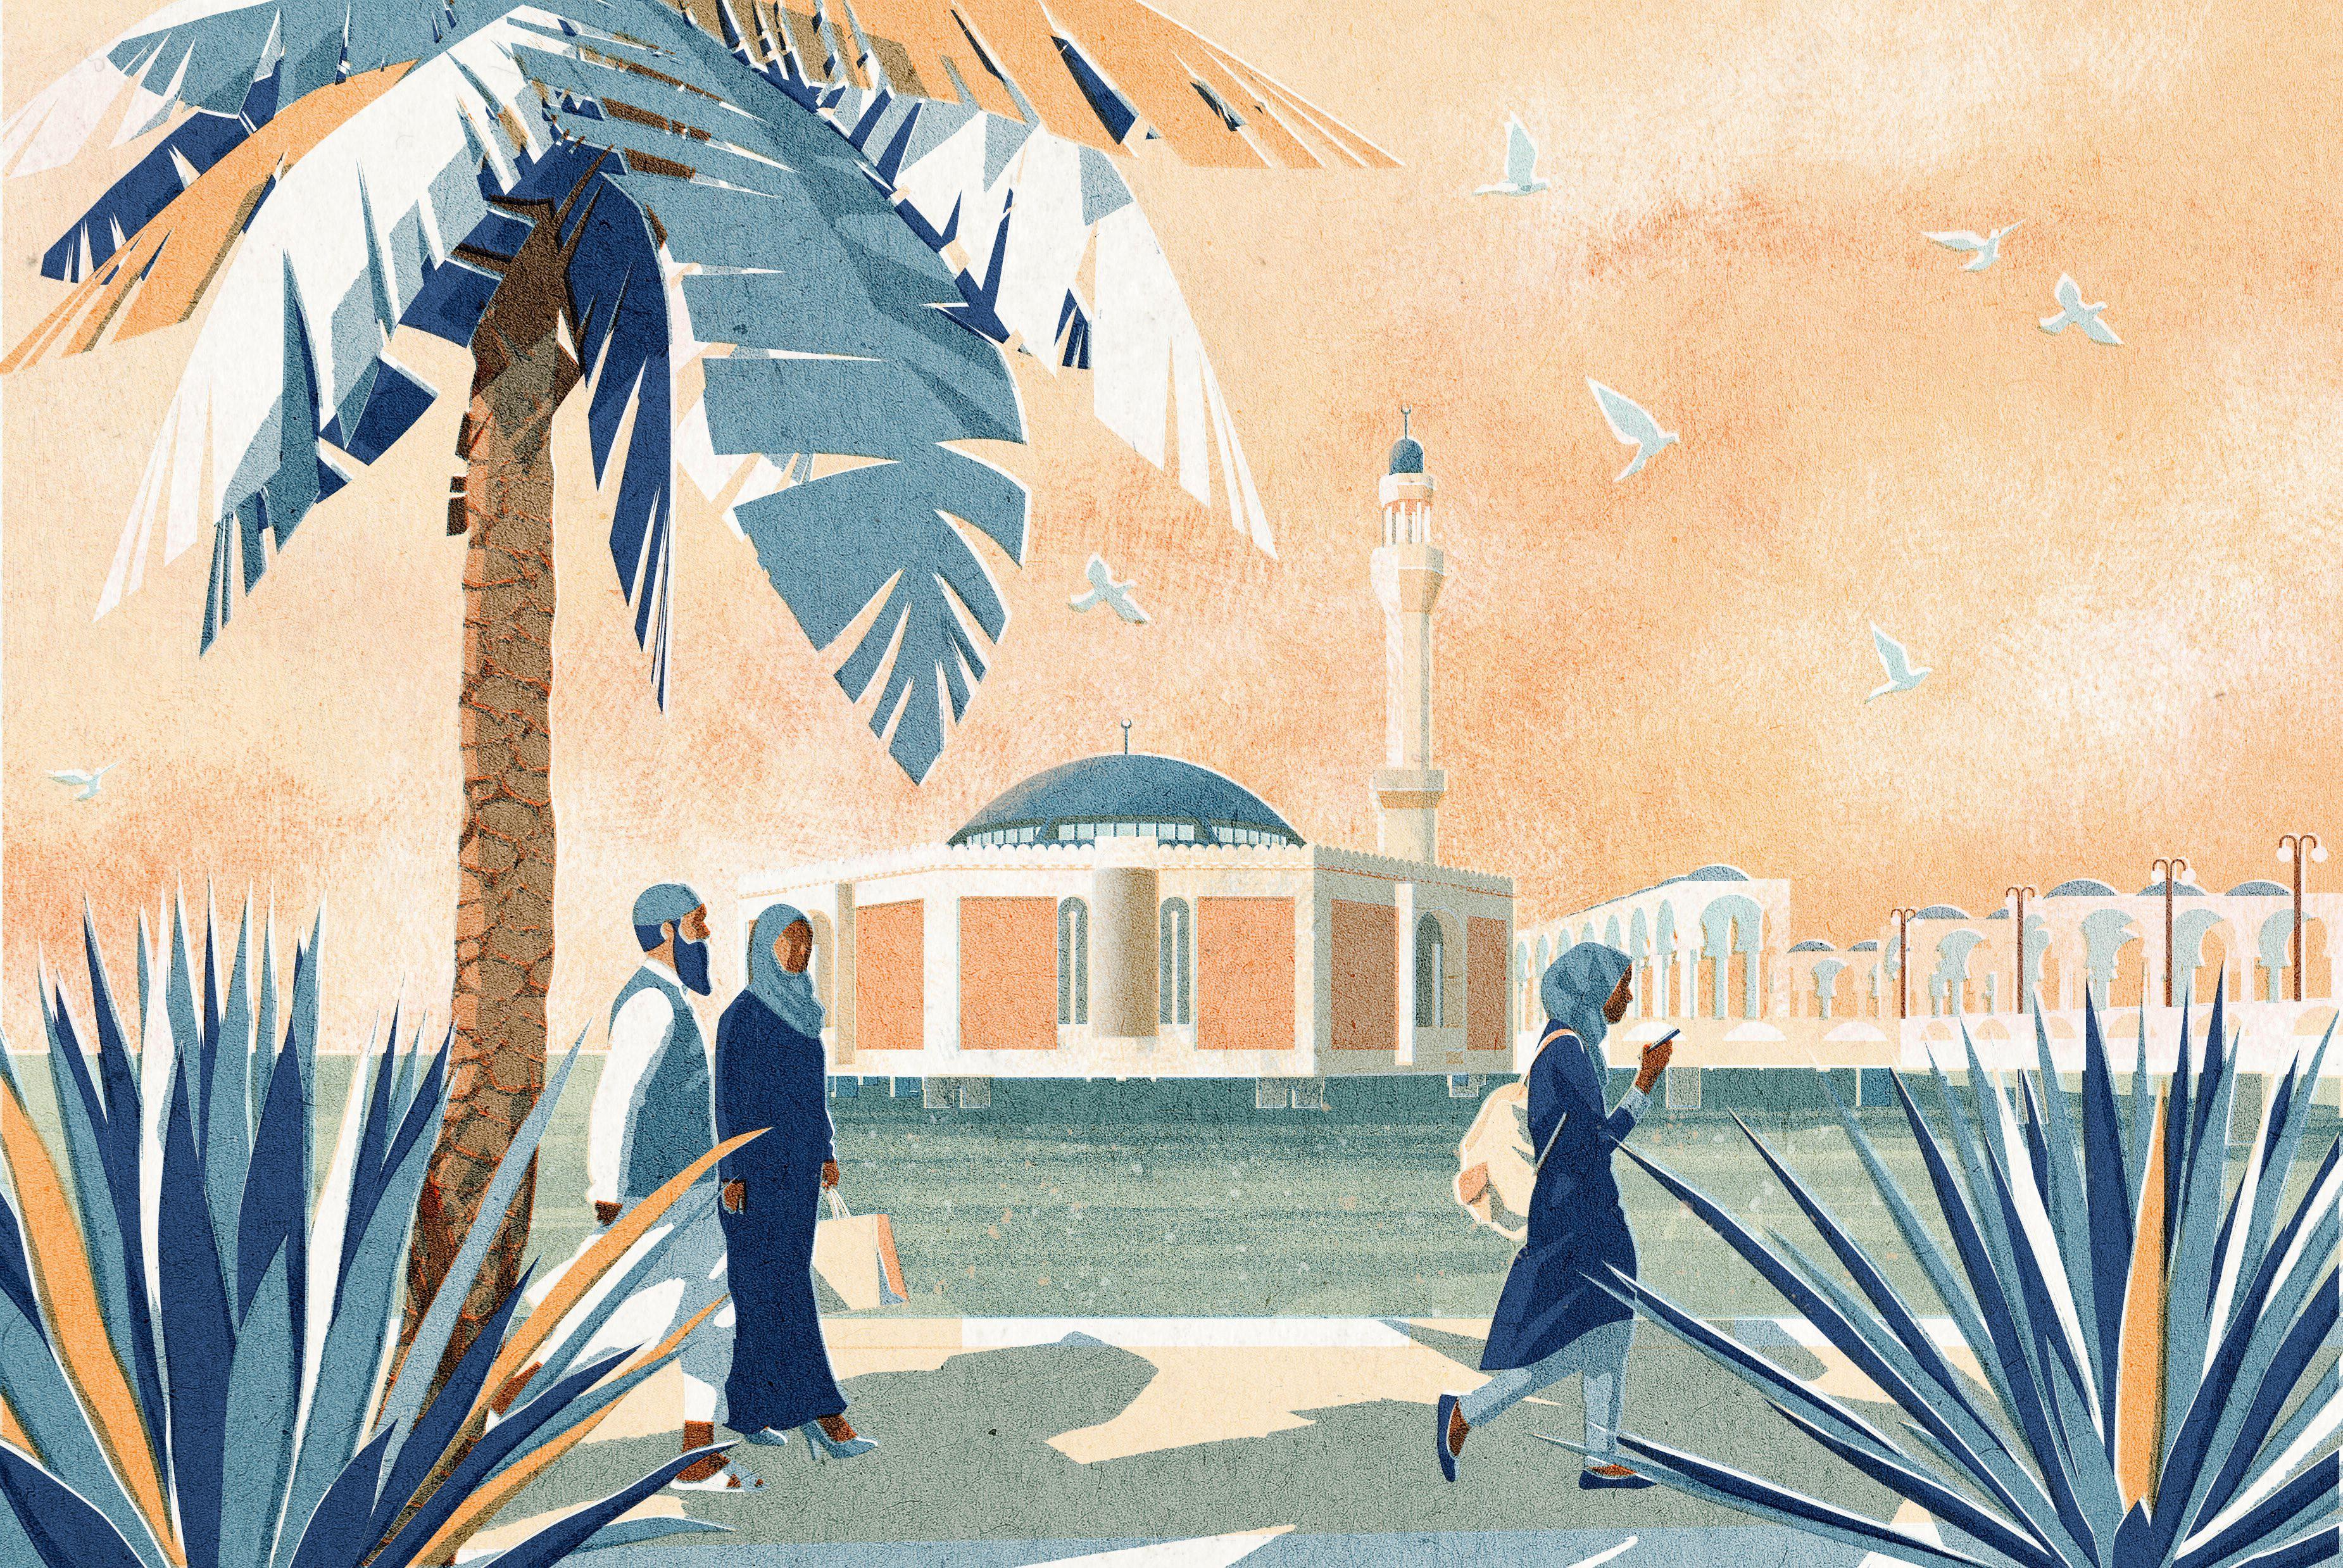 Jeddah - Books